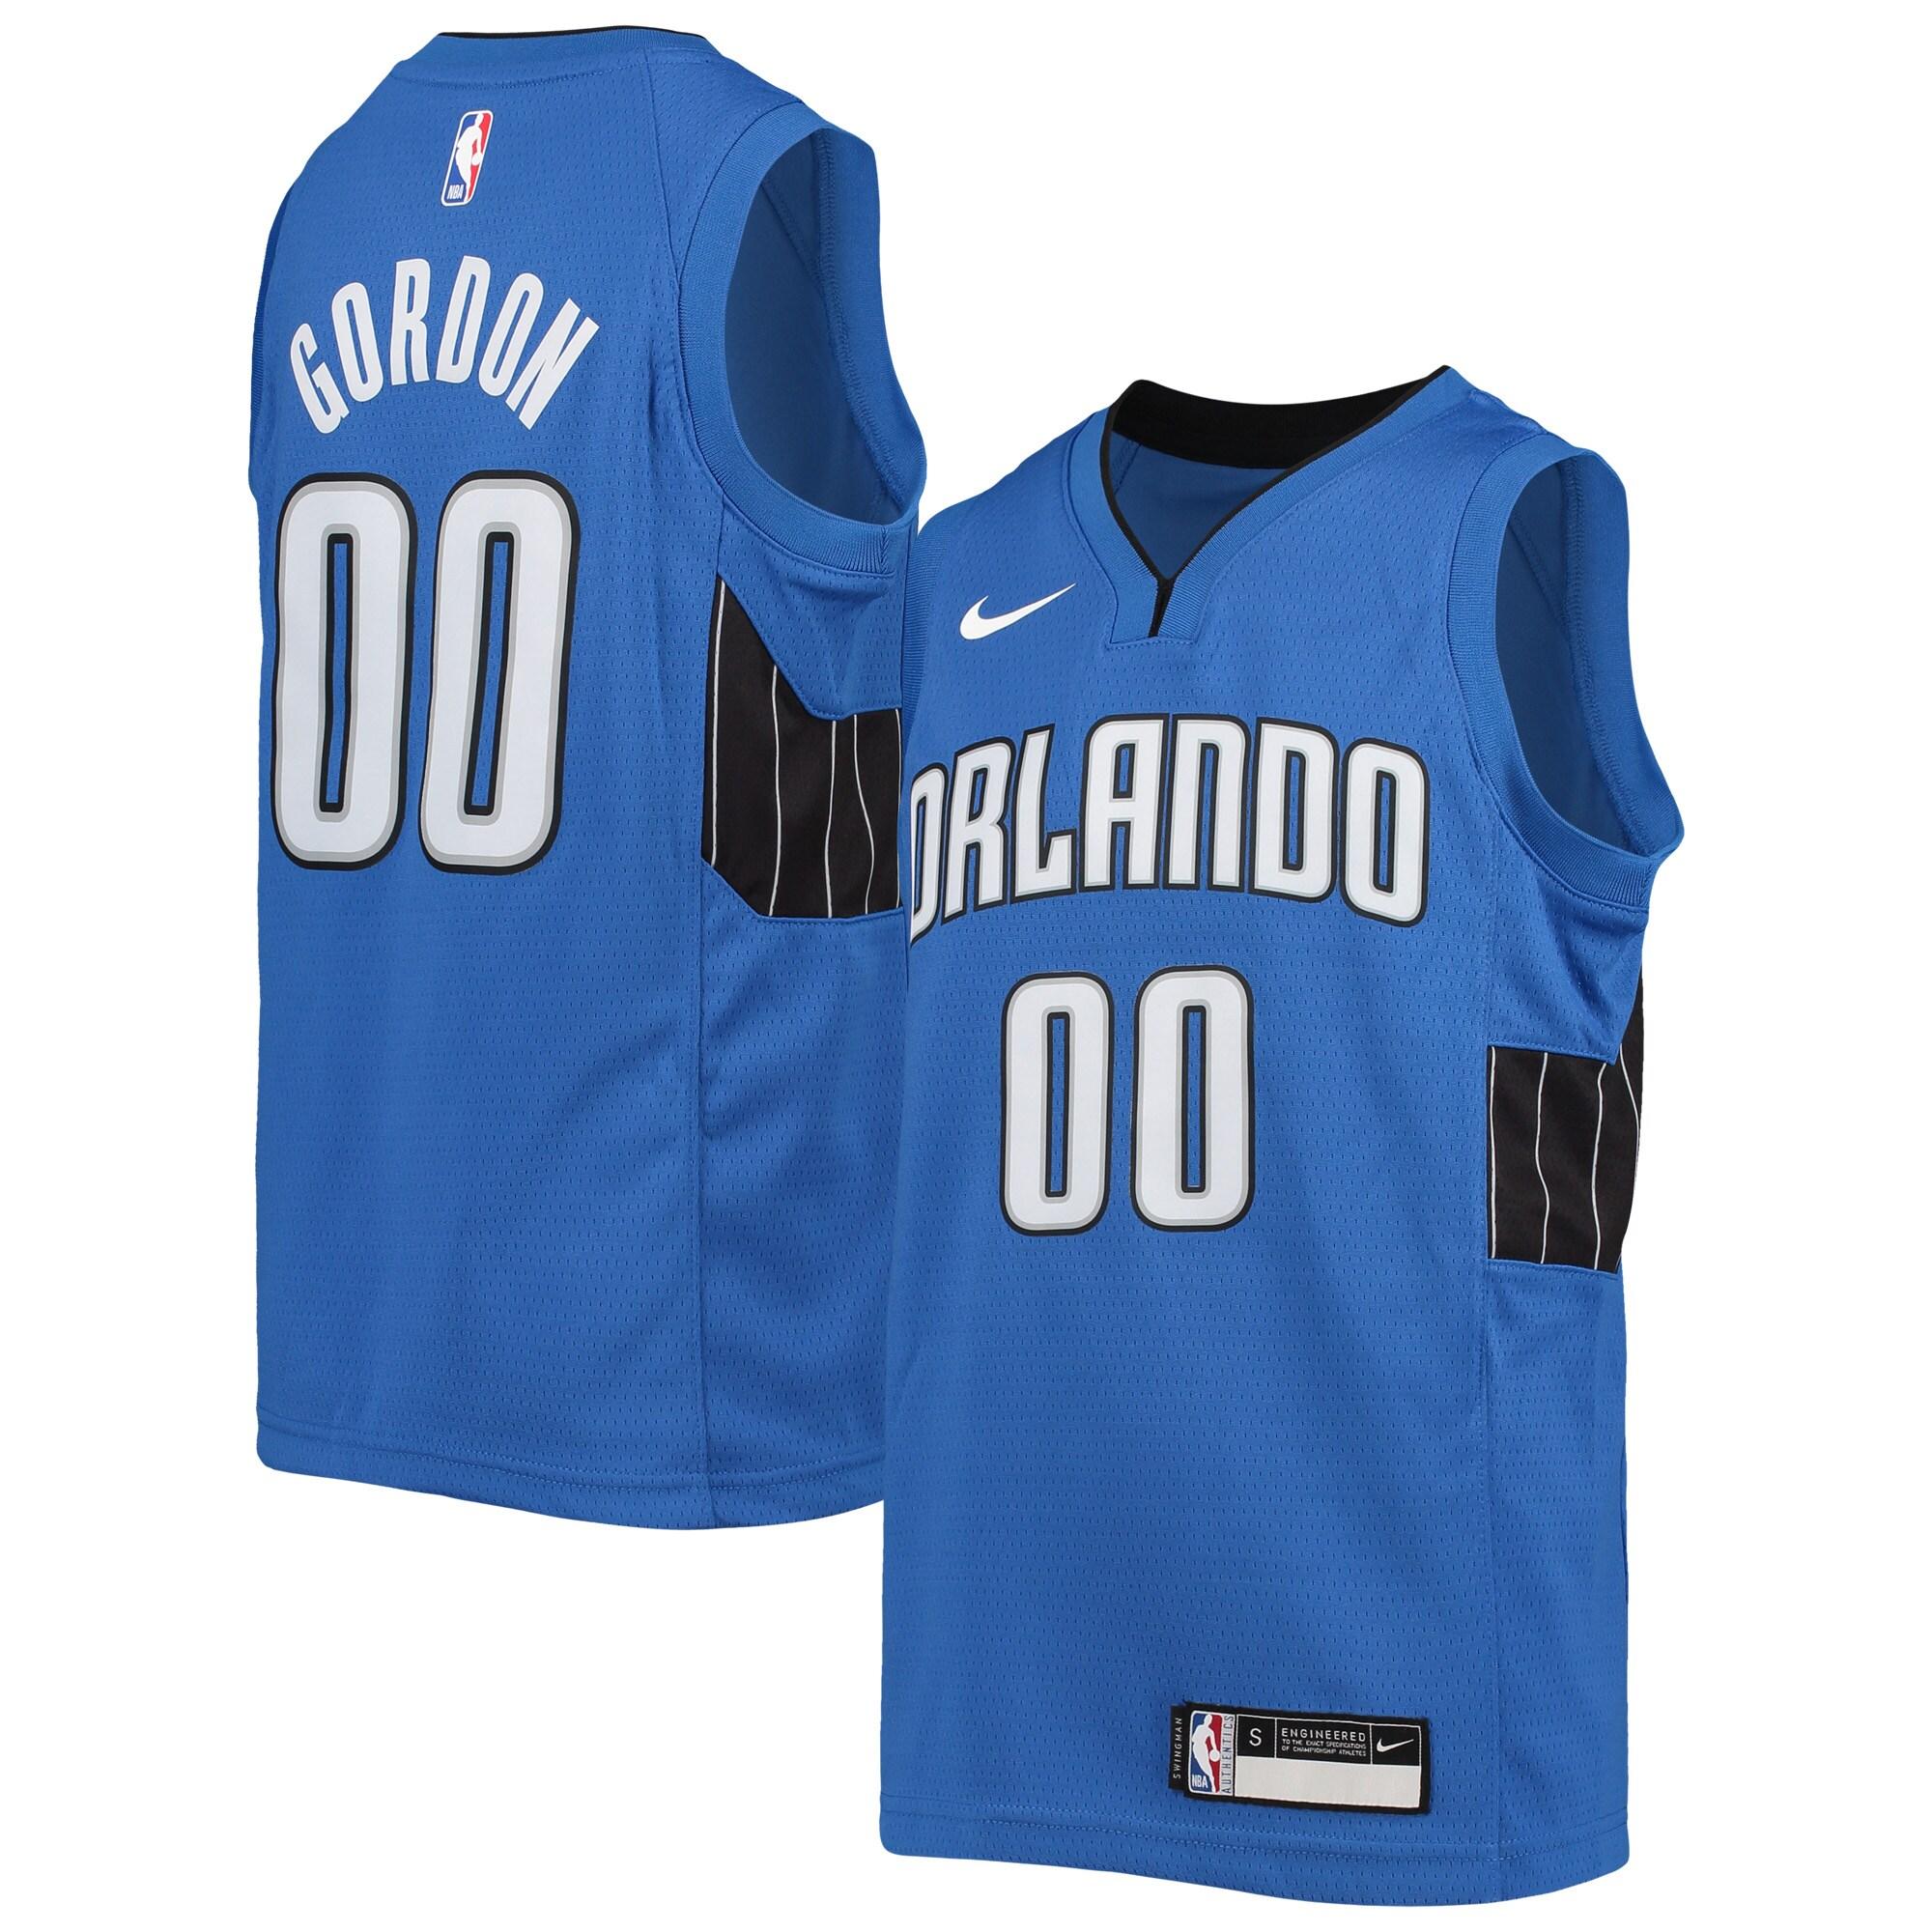 Aaron Gordon Orlando Magic Nike Youth Swingman Player Jersey - Statement Edition - Blue